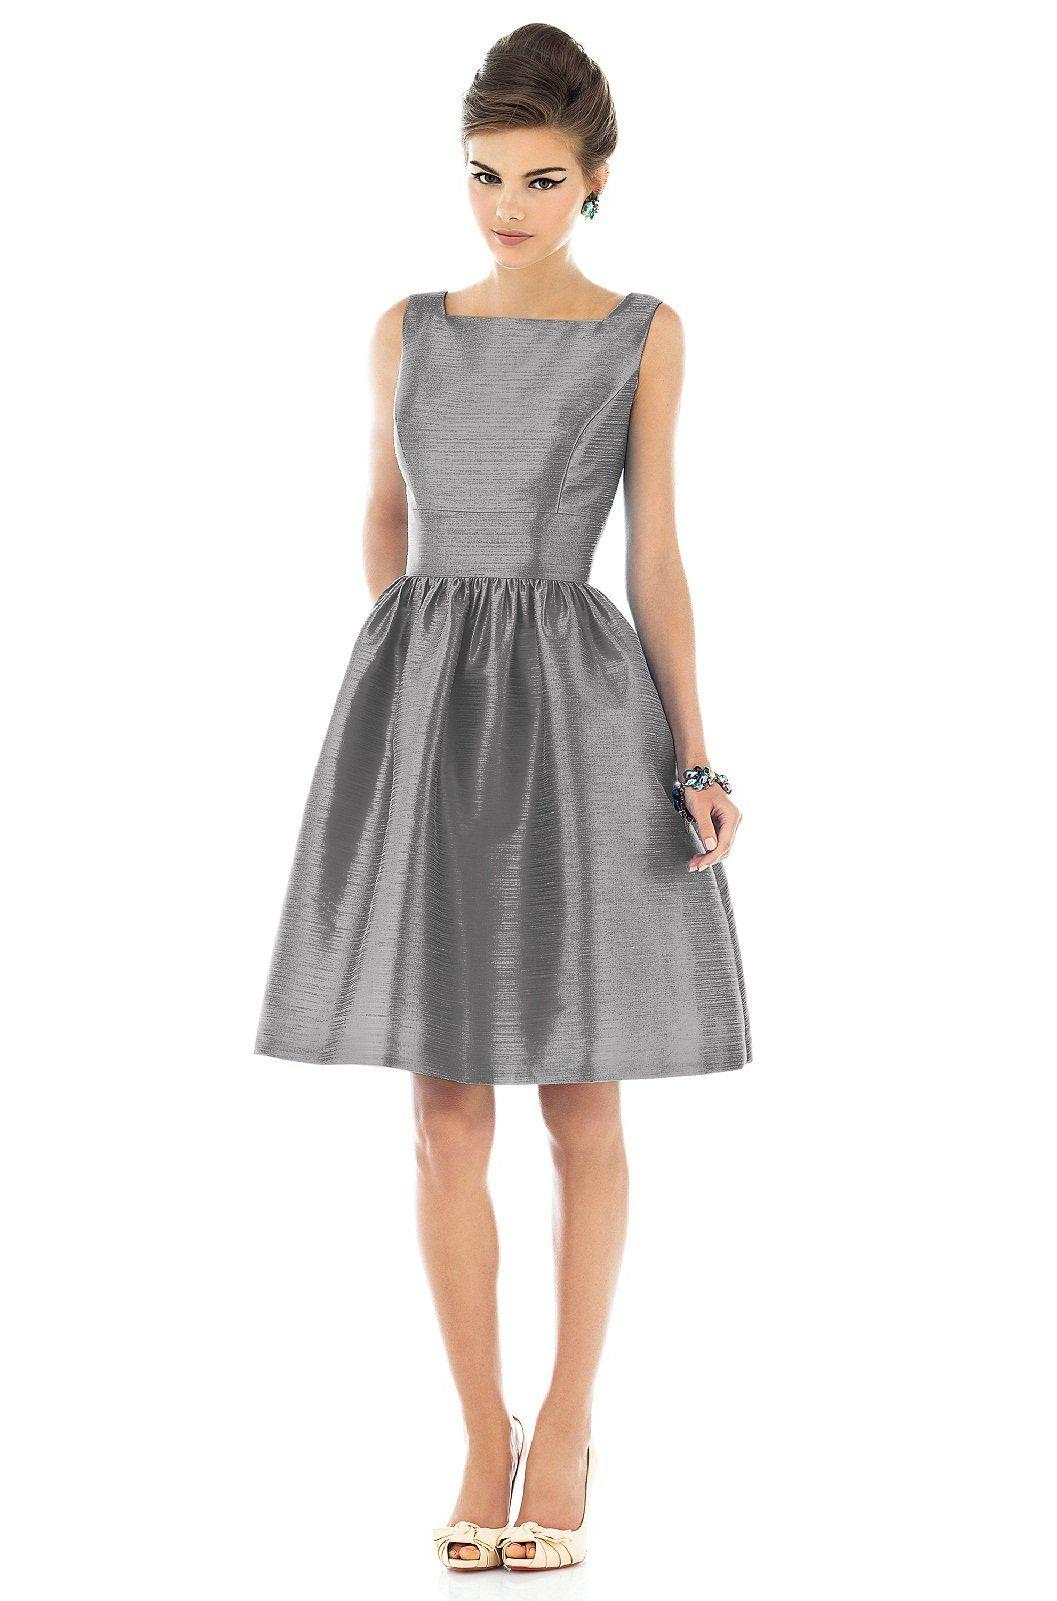 Alfred sung d518 bridesmaid dress 135 fabric dupioni color alfred sung d518 bridesmaid dress 135 fabric dupioni color quarry ombrellifo Gallery